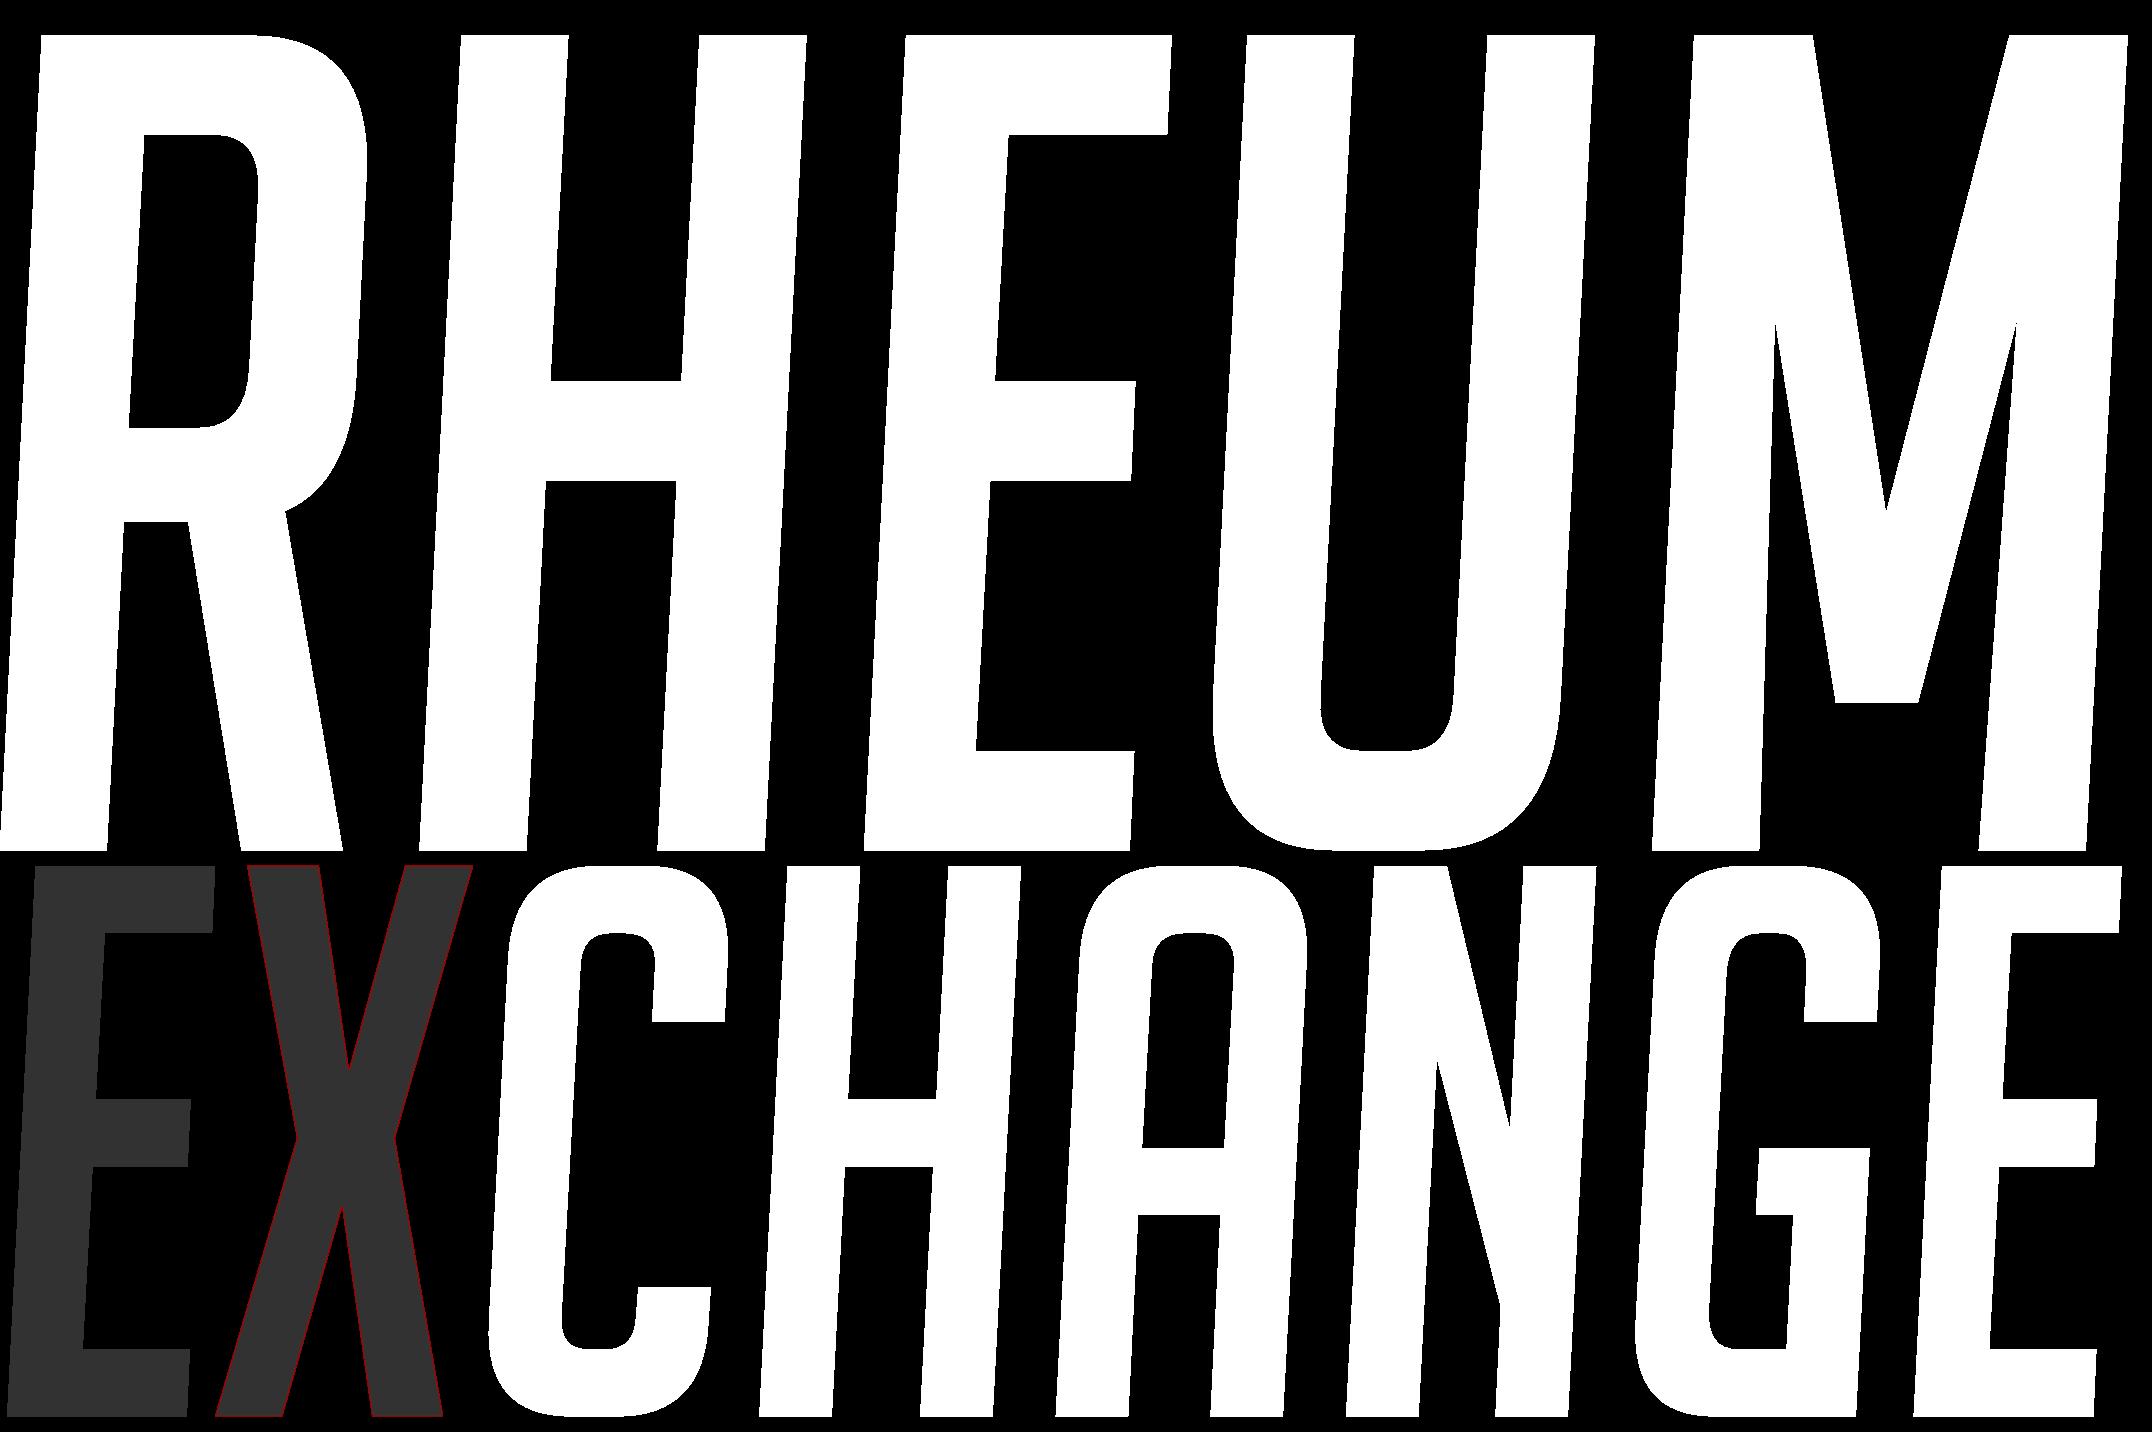 RheumExchange